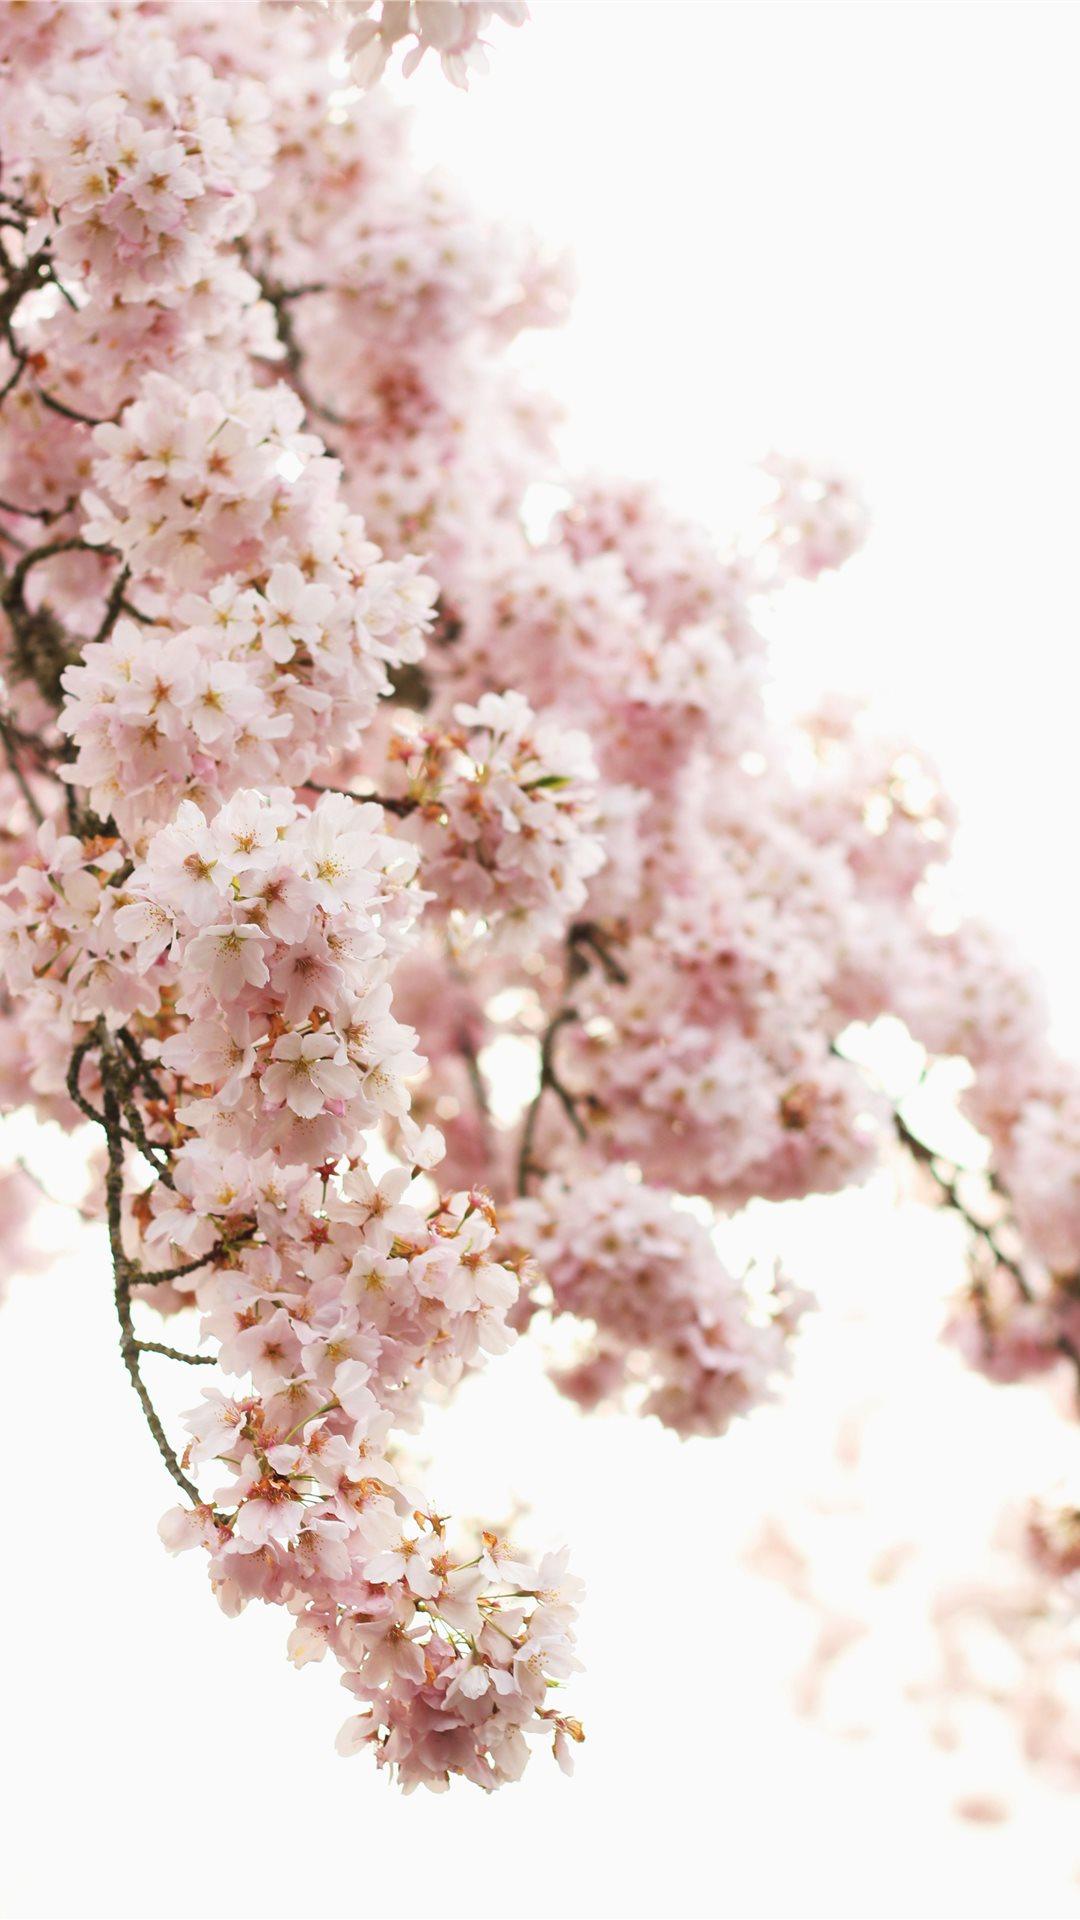 Spring Apple wallpaper